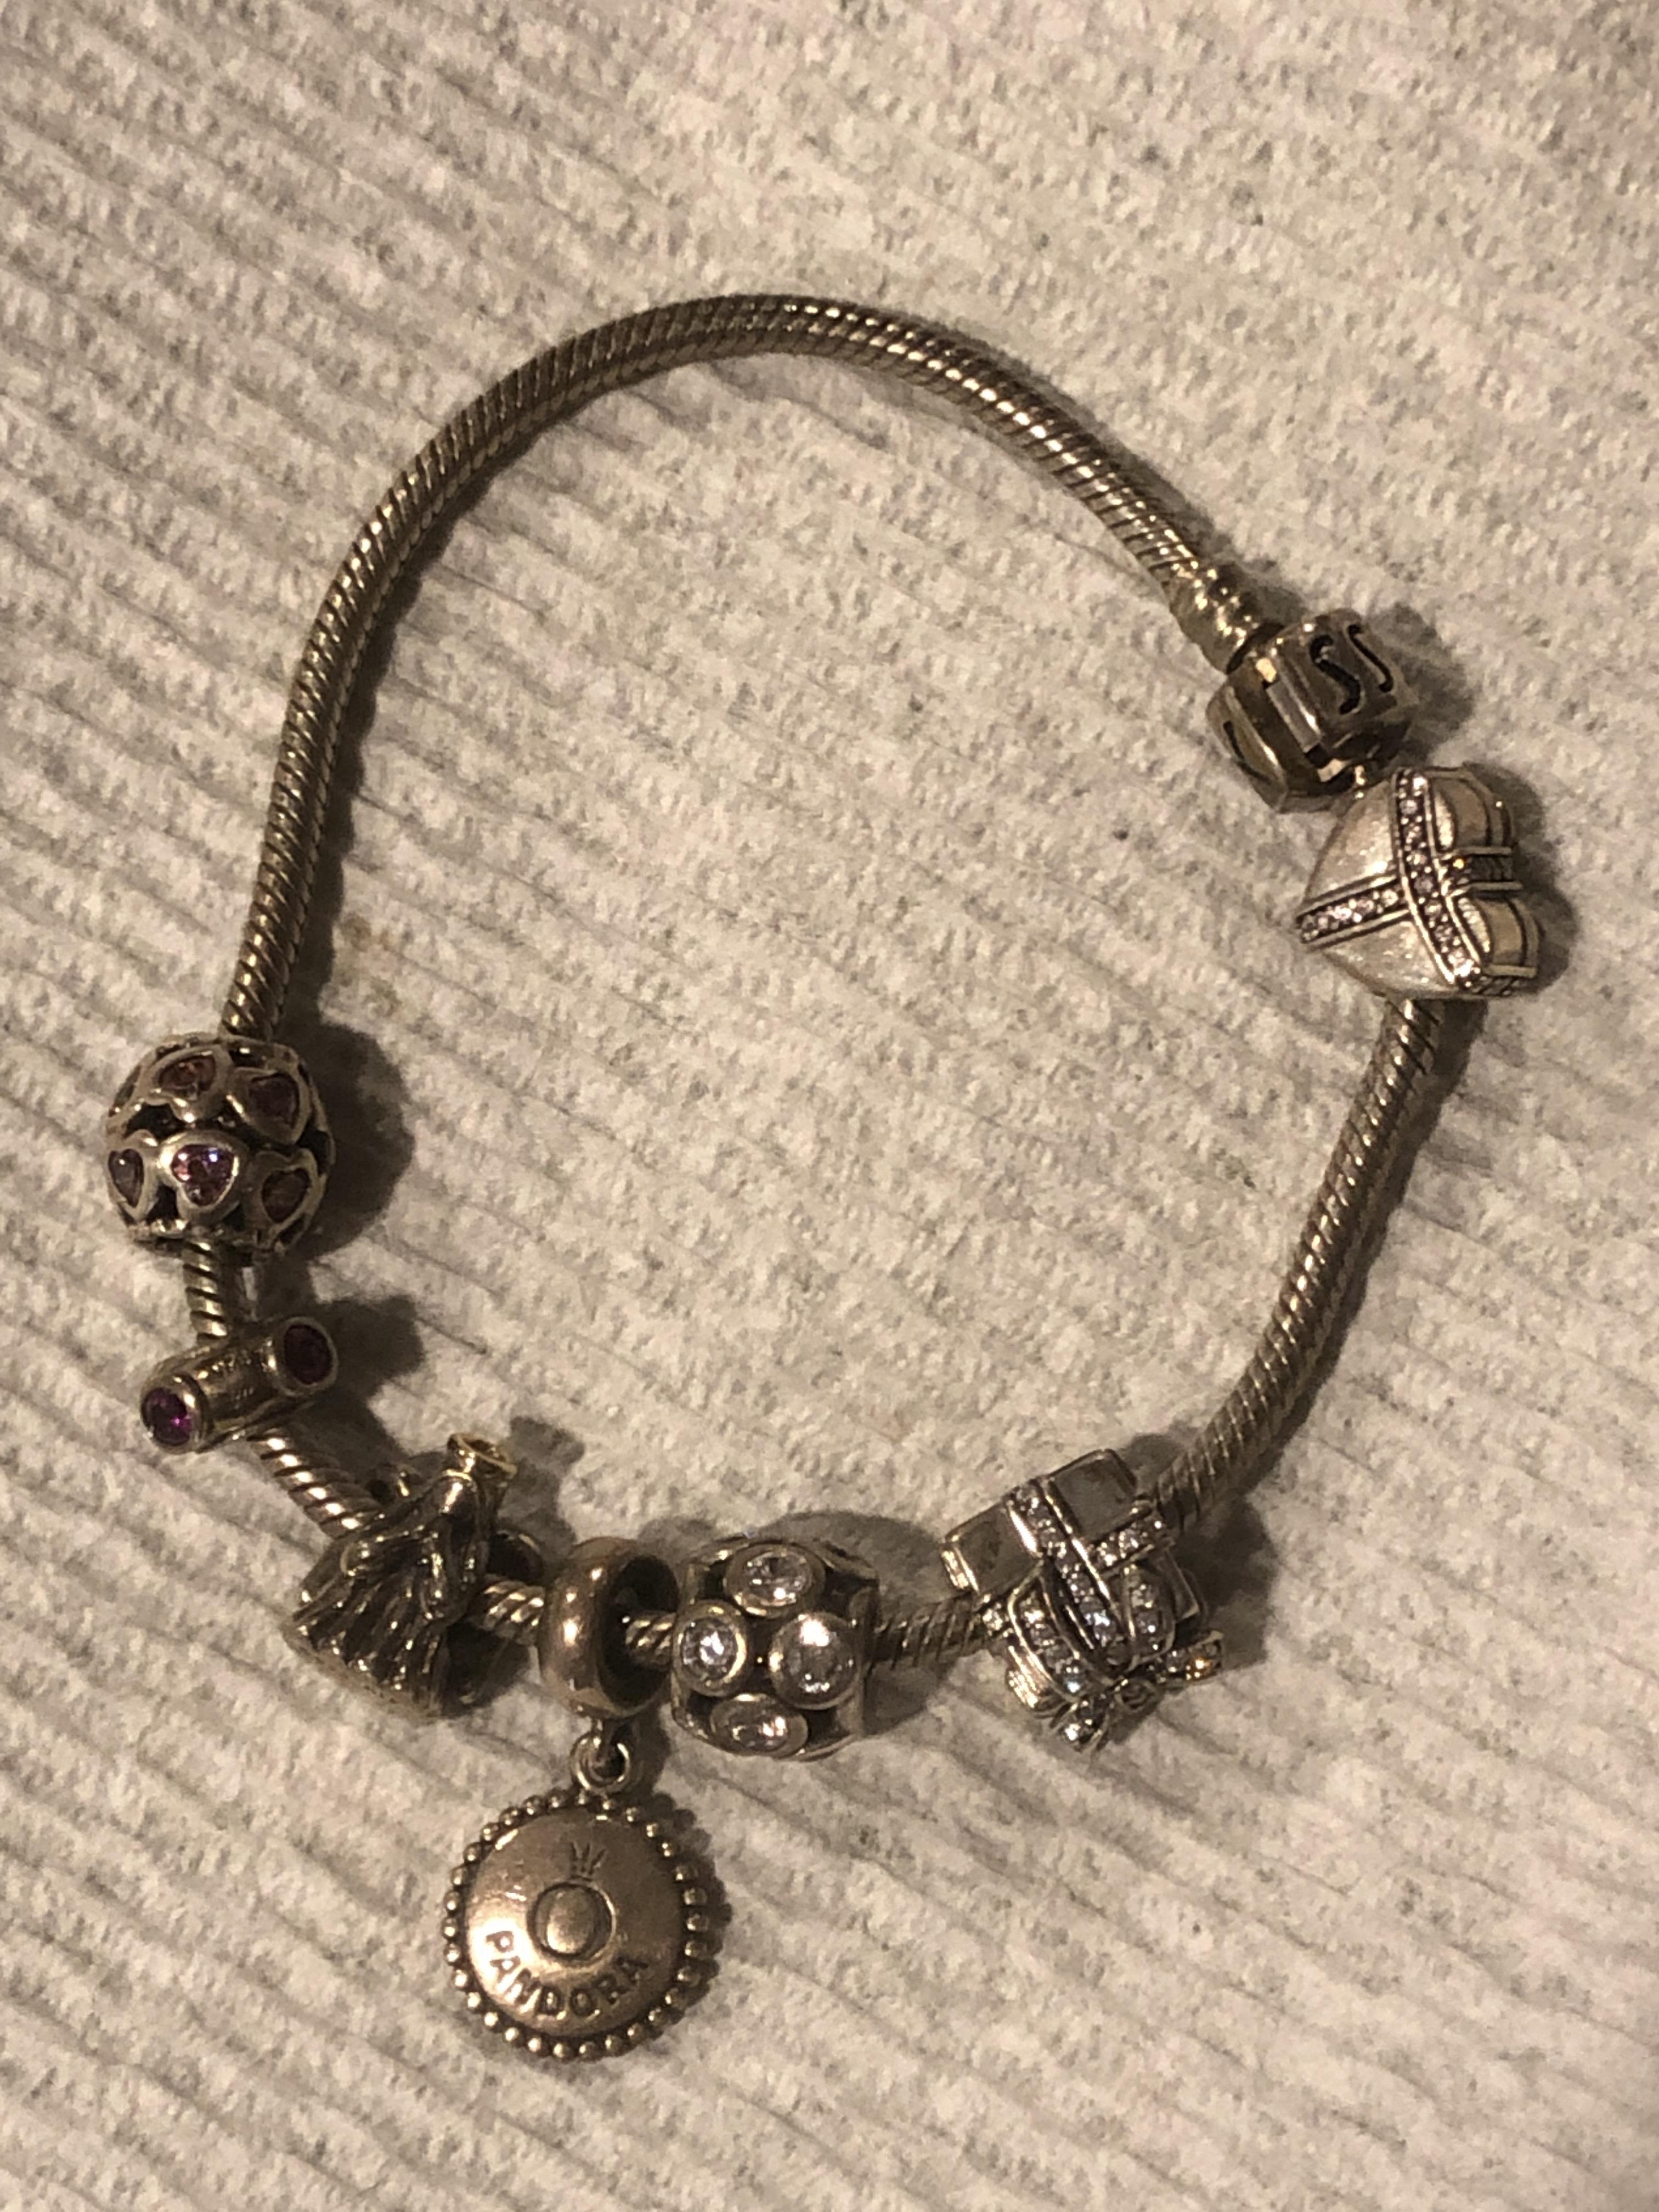 Pandora Charm Bracelets Reviews In Bracelets Chickadvisor